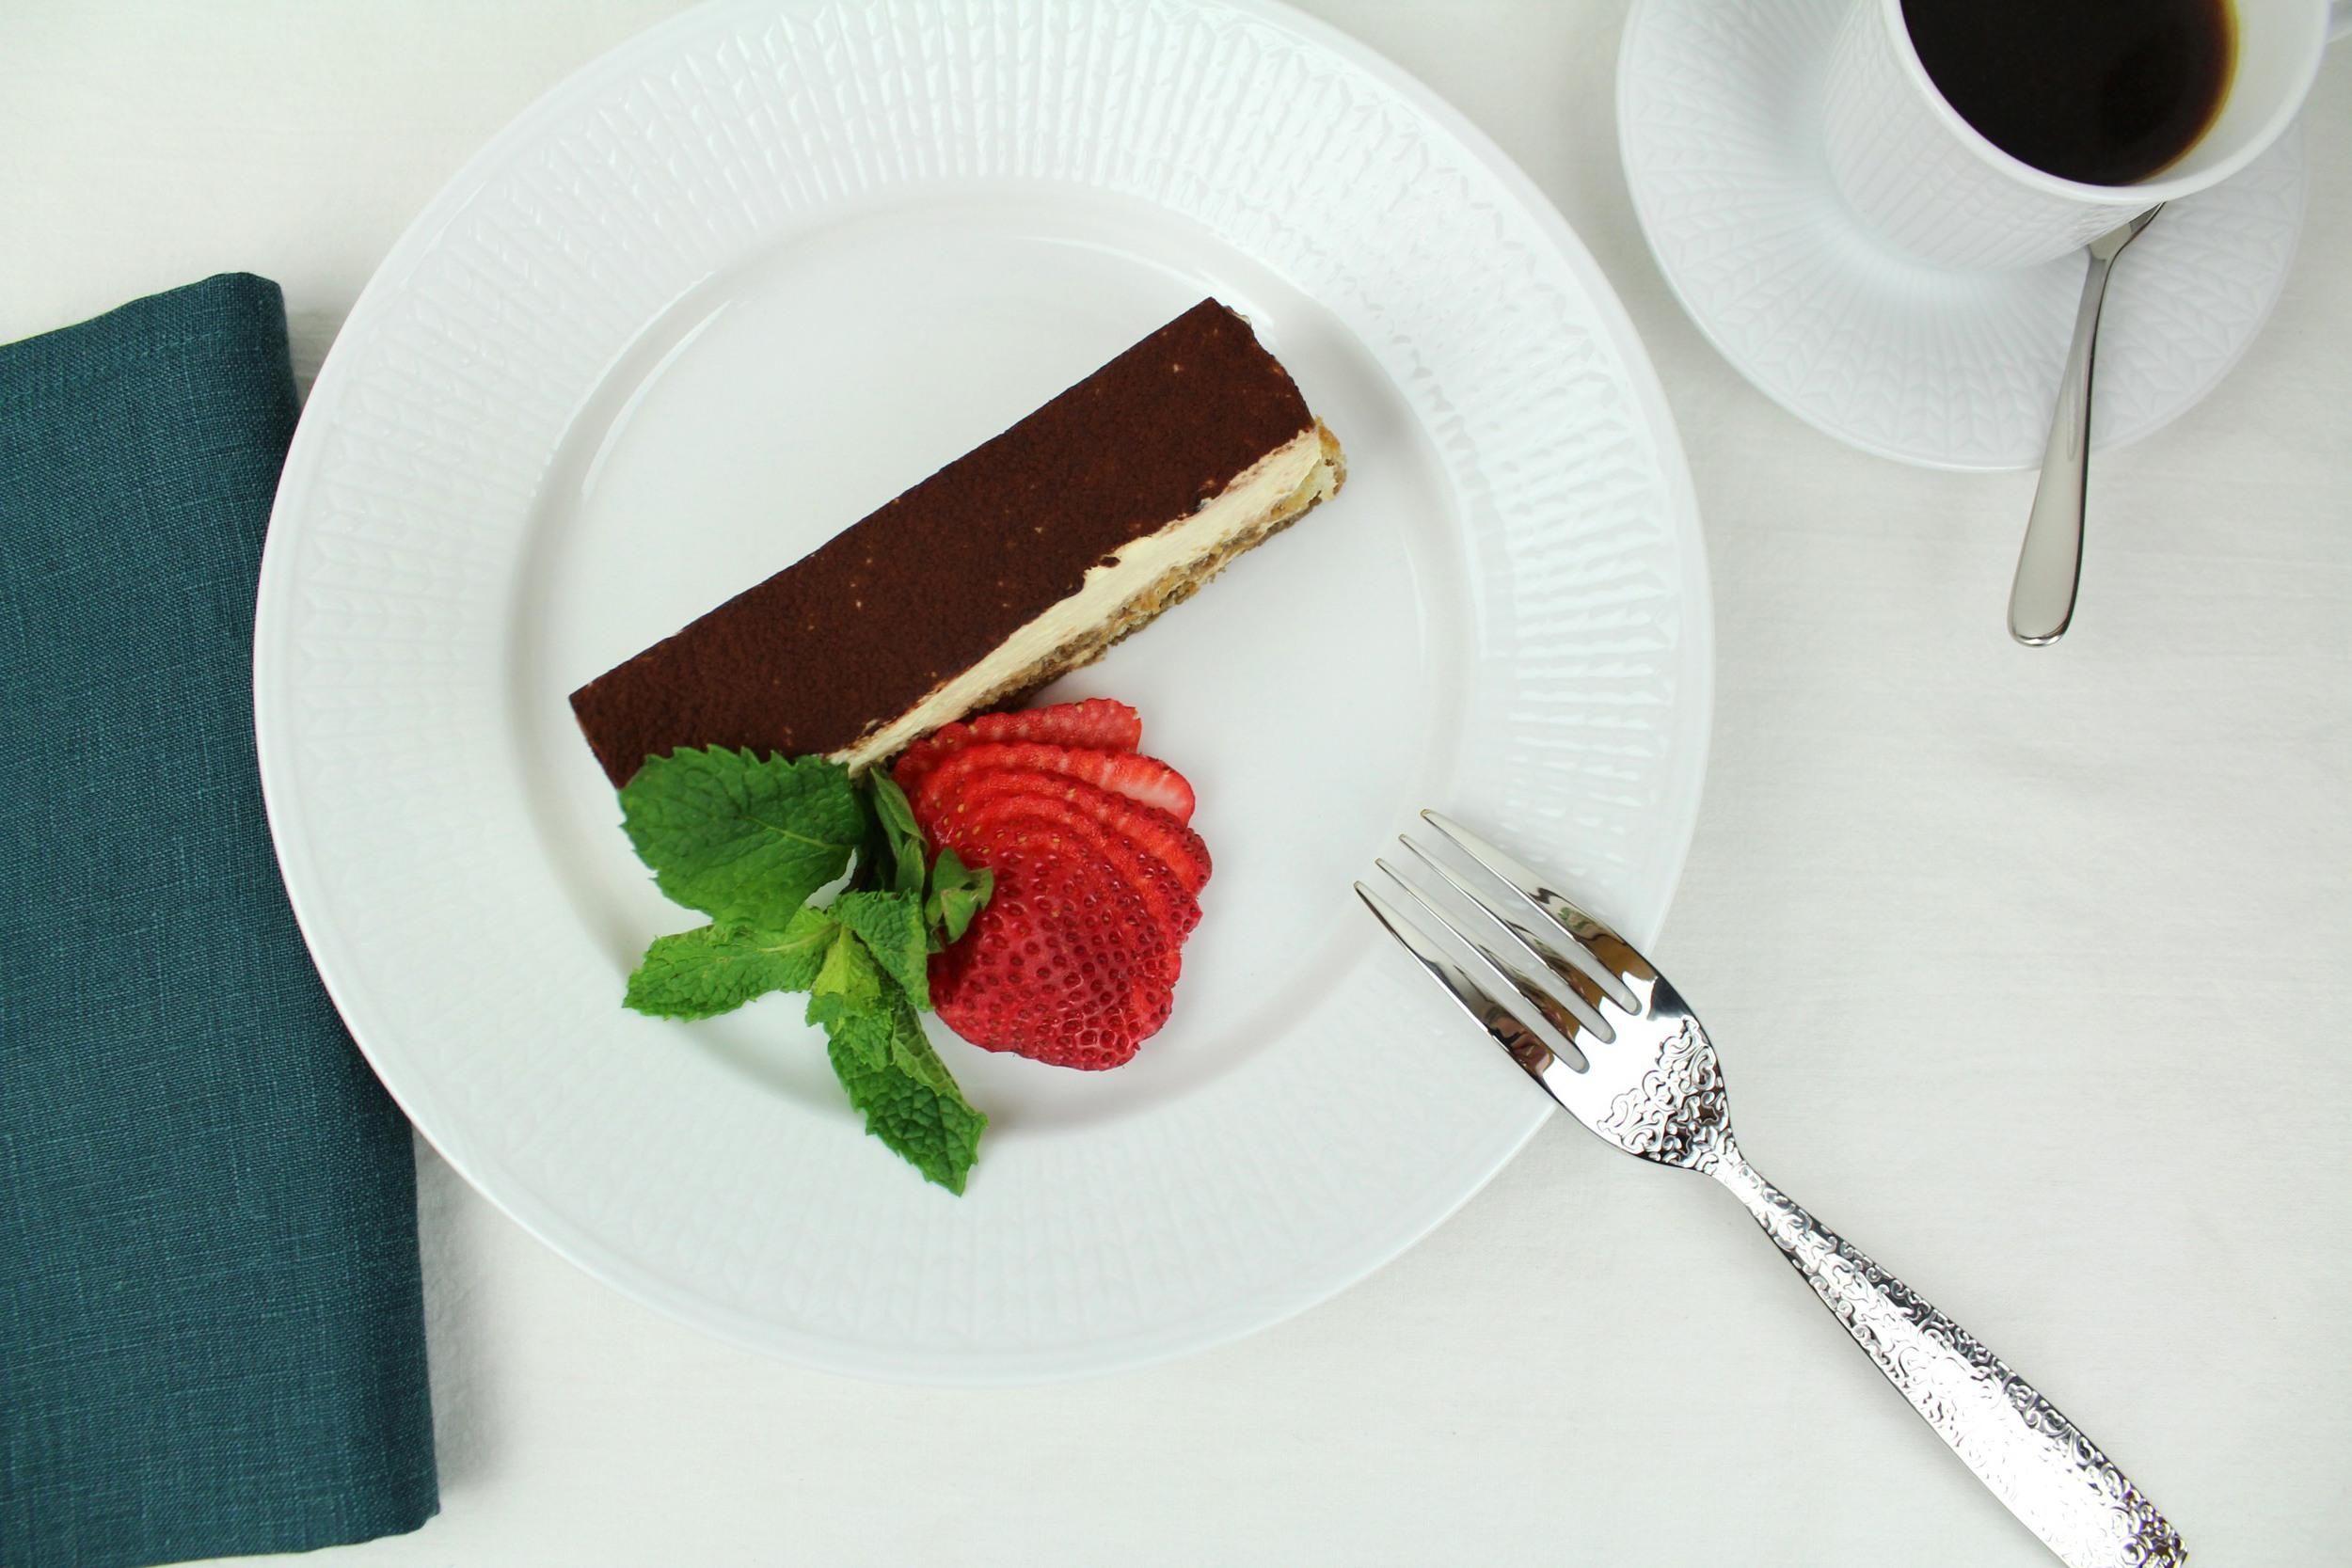 Rorstrand  Swedish Grace salad plate ,  espresso cup ,  espresso saucer , Alessi Nuovo Milano mocha spoon,  Libeco Vence linen napkin in Teal ,  Alessi Dressed dessert fork .